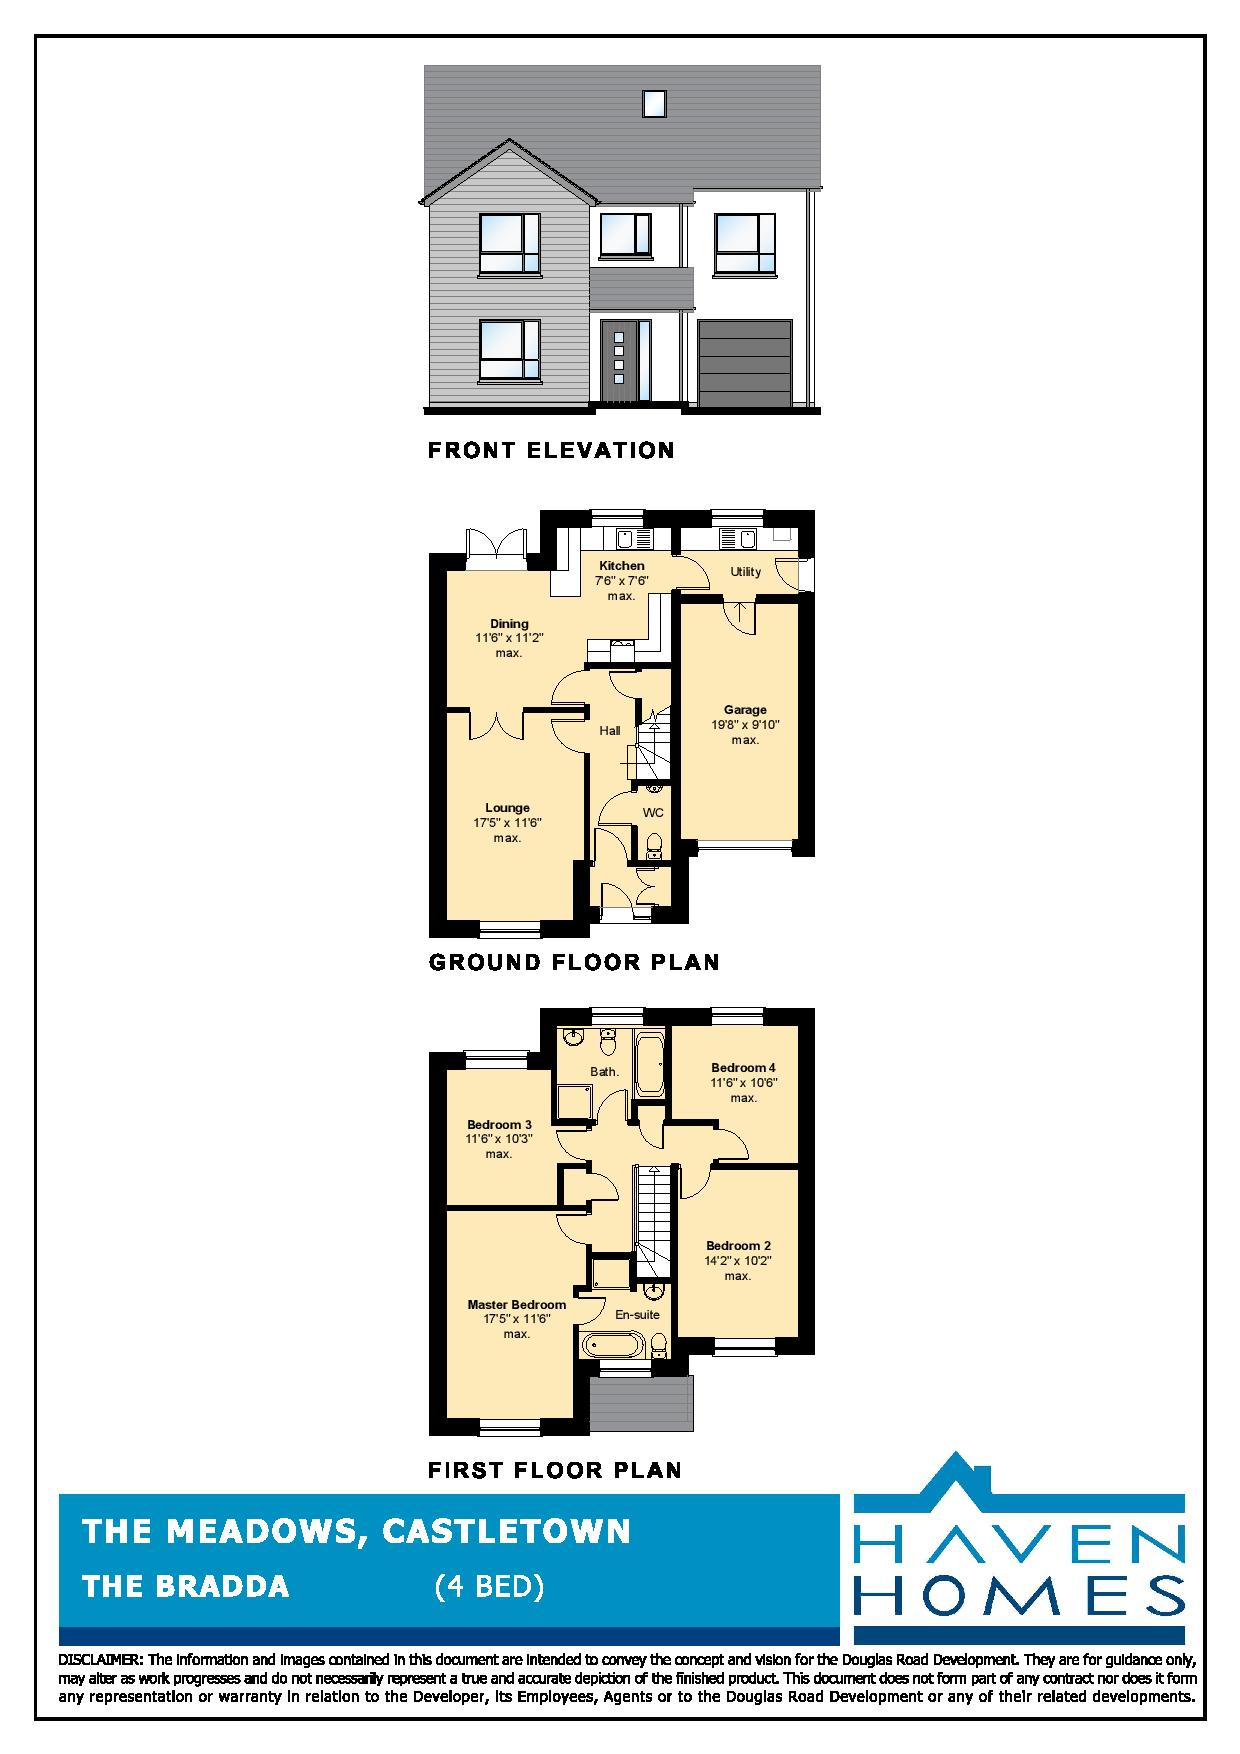 Show Home (Plot 43), The Meadows, Castletown Floorplan